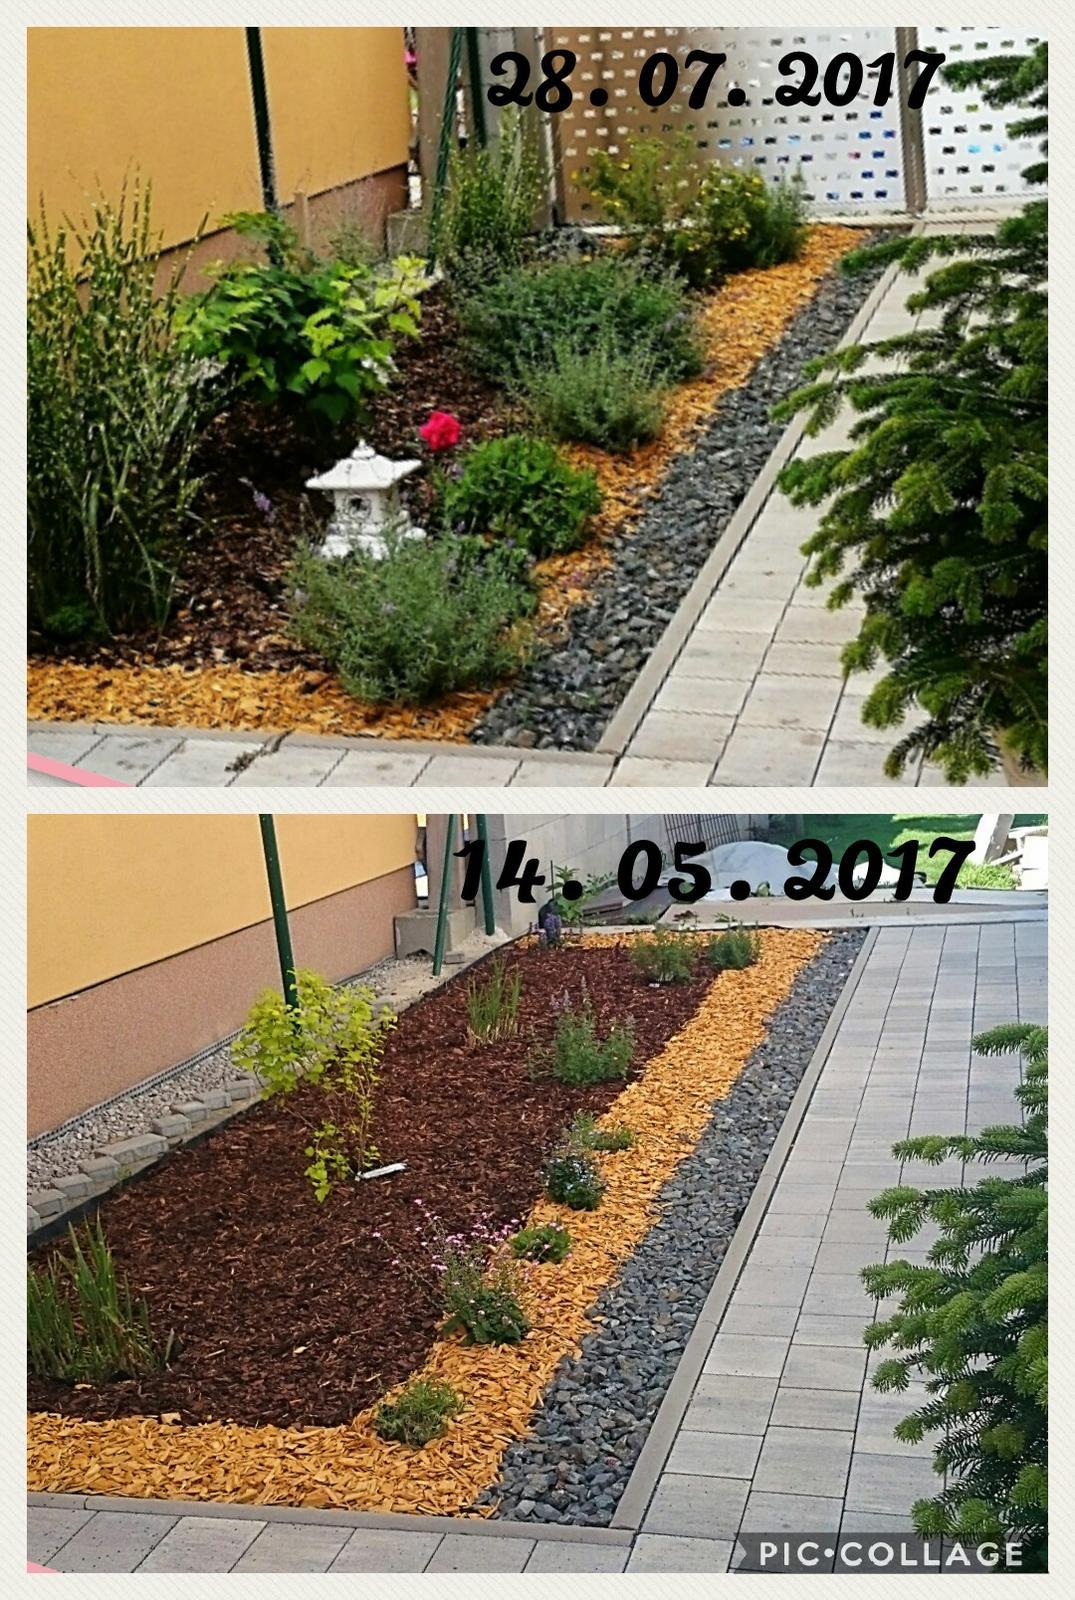 Záhradka - Zahon medzi domami, vysadene levandule, salvia trvaka, kocurik, ruze a travy..  ( kricky dopisem)